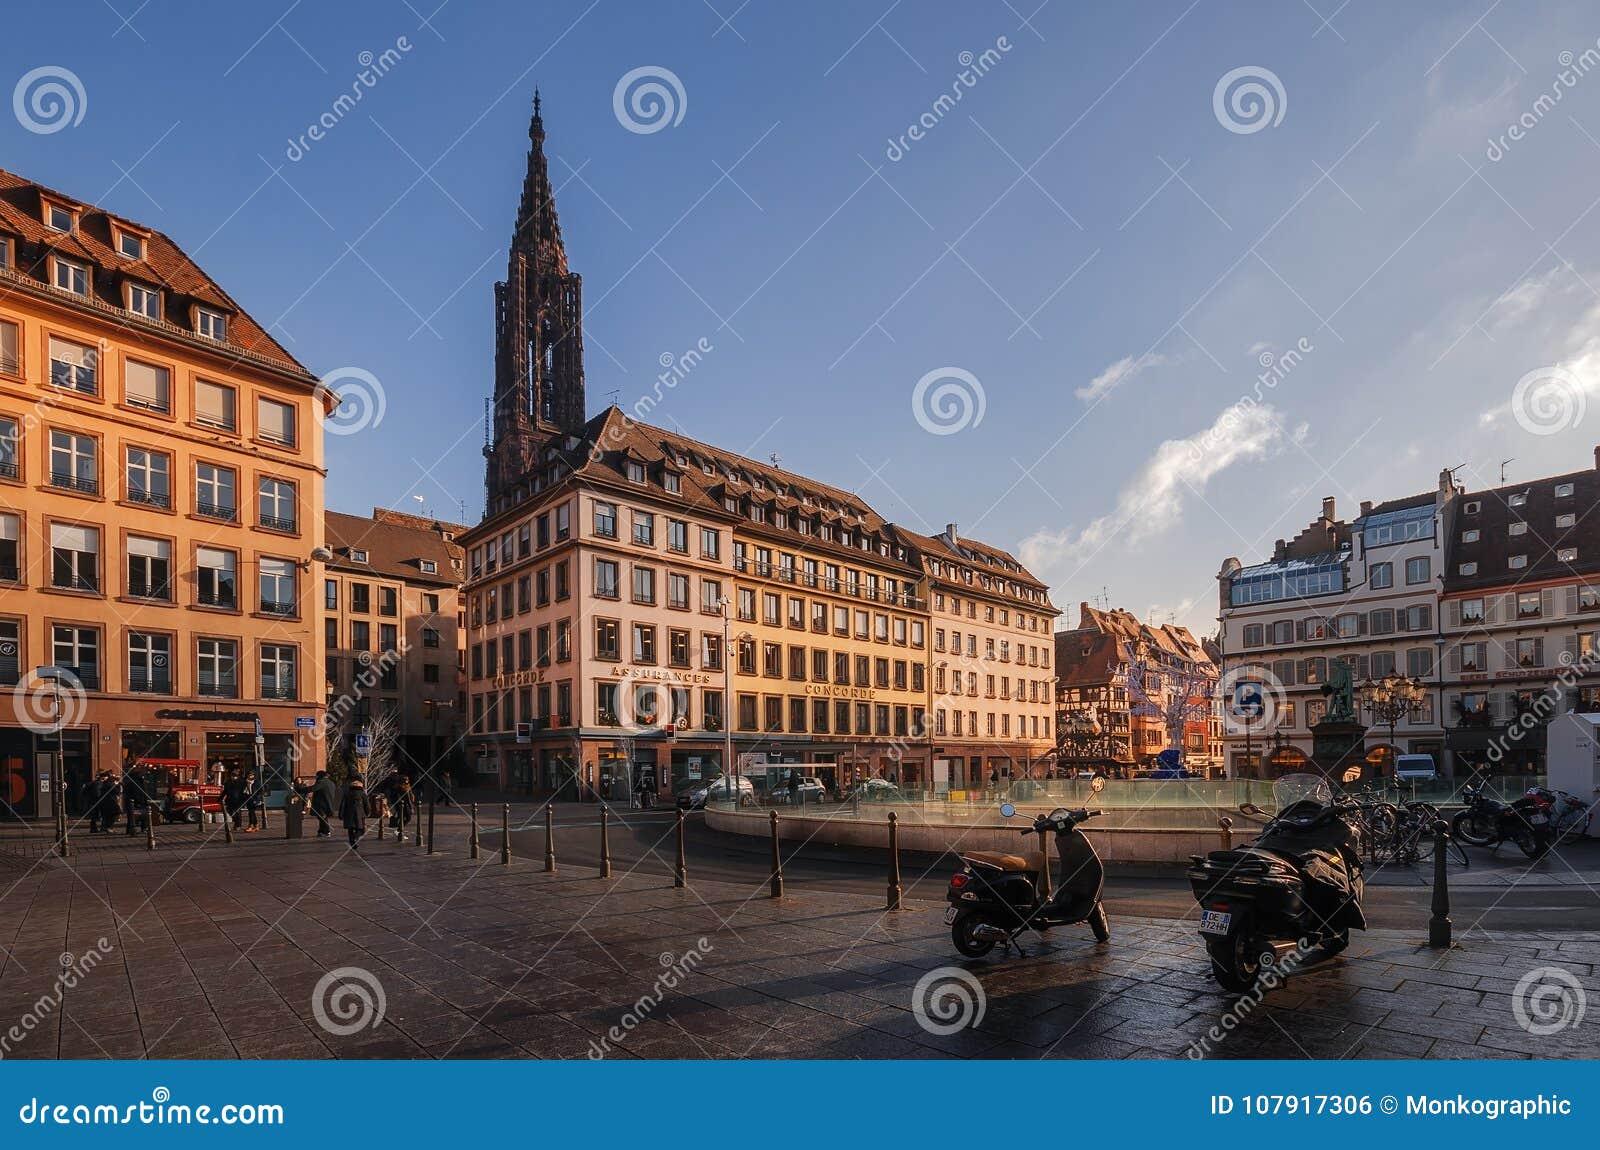 STRASBOURG, FRANCE - JANUARY 5, 2017: Historic area in center of old city of Strasburg